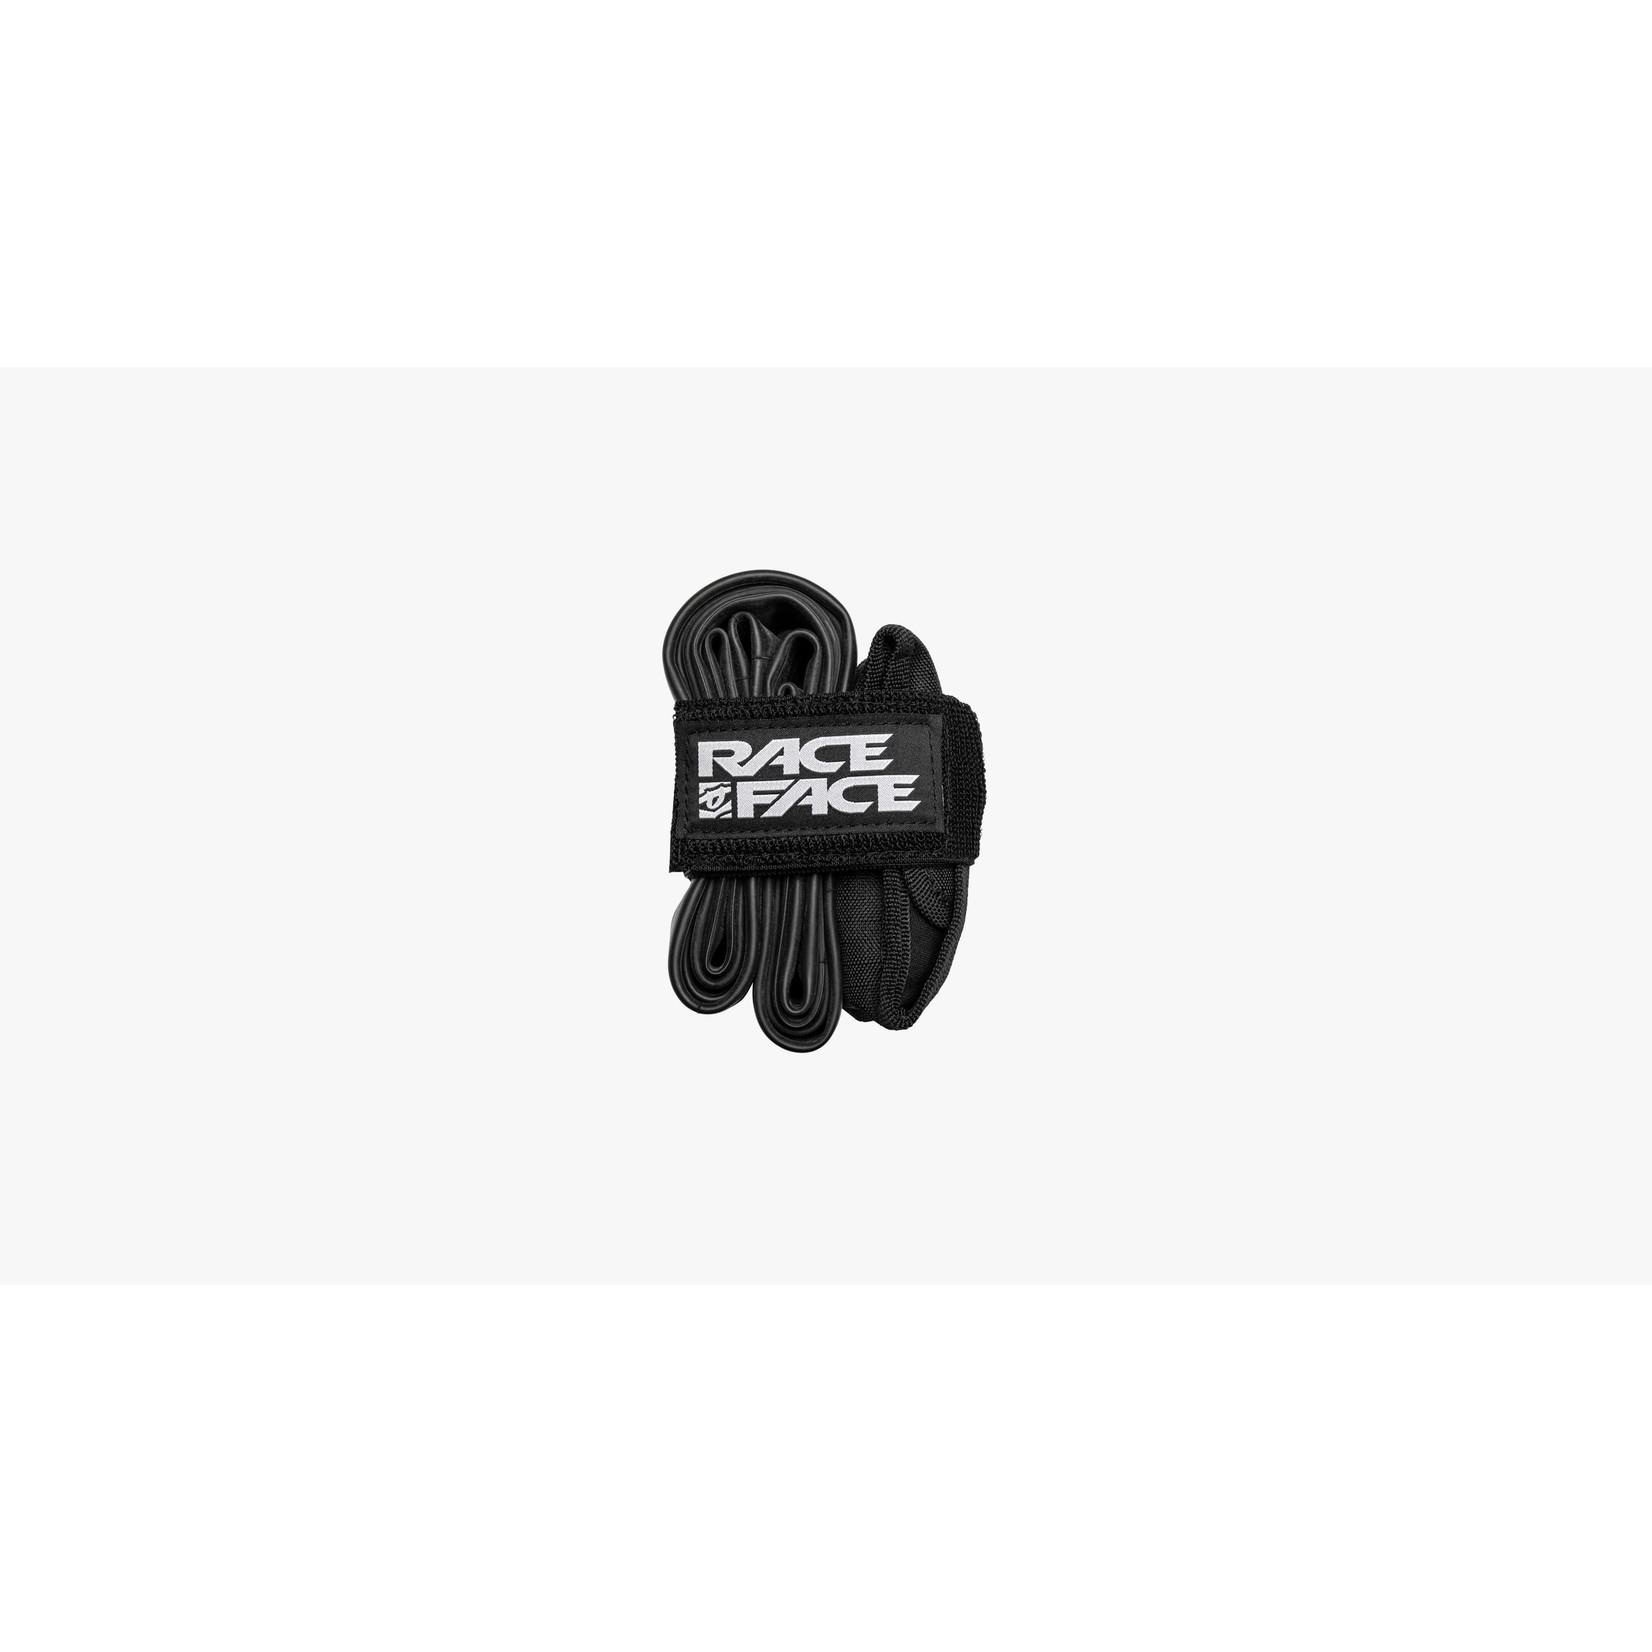 Race Face Raceface Stash toolwrap